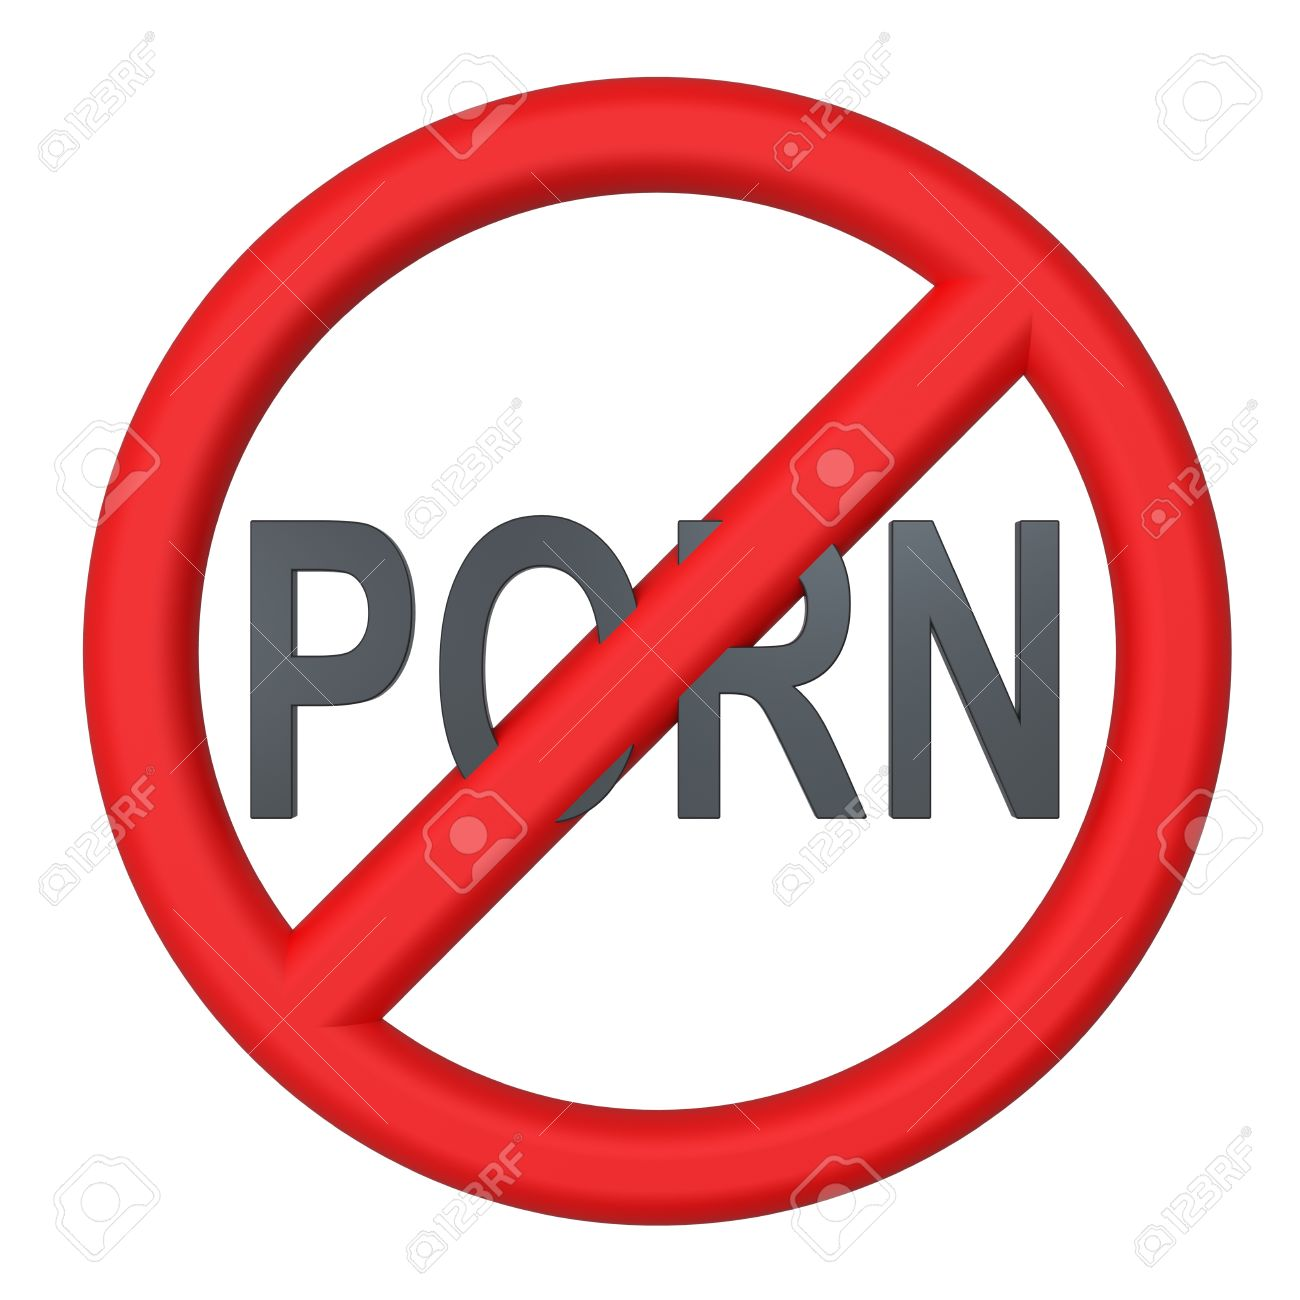 porn clip art Art can be pornographic.